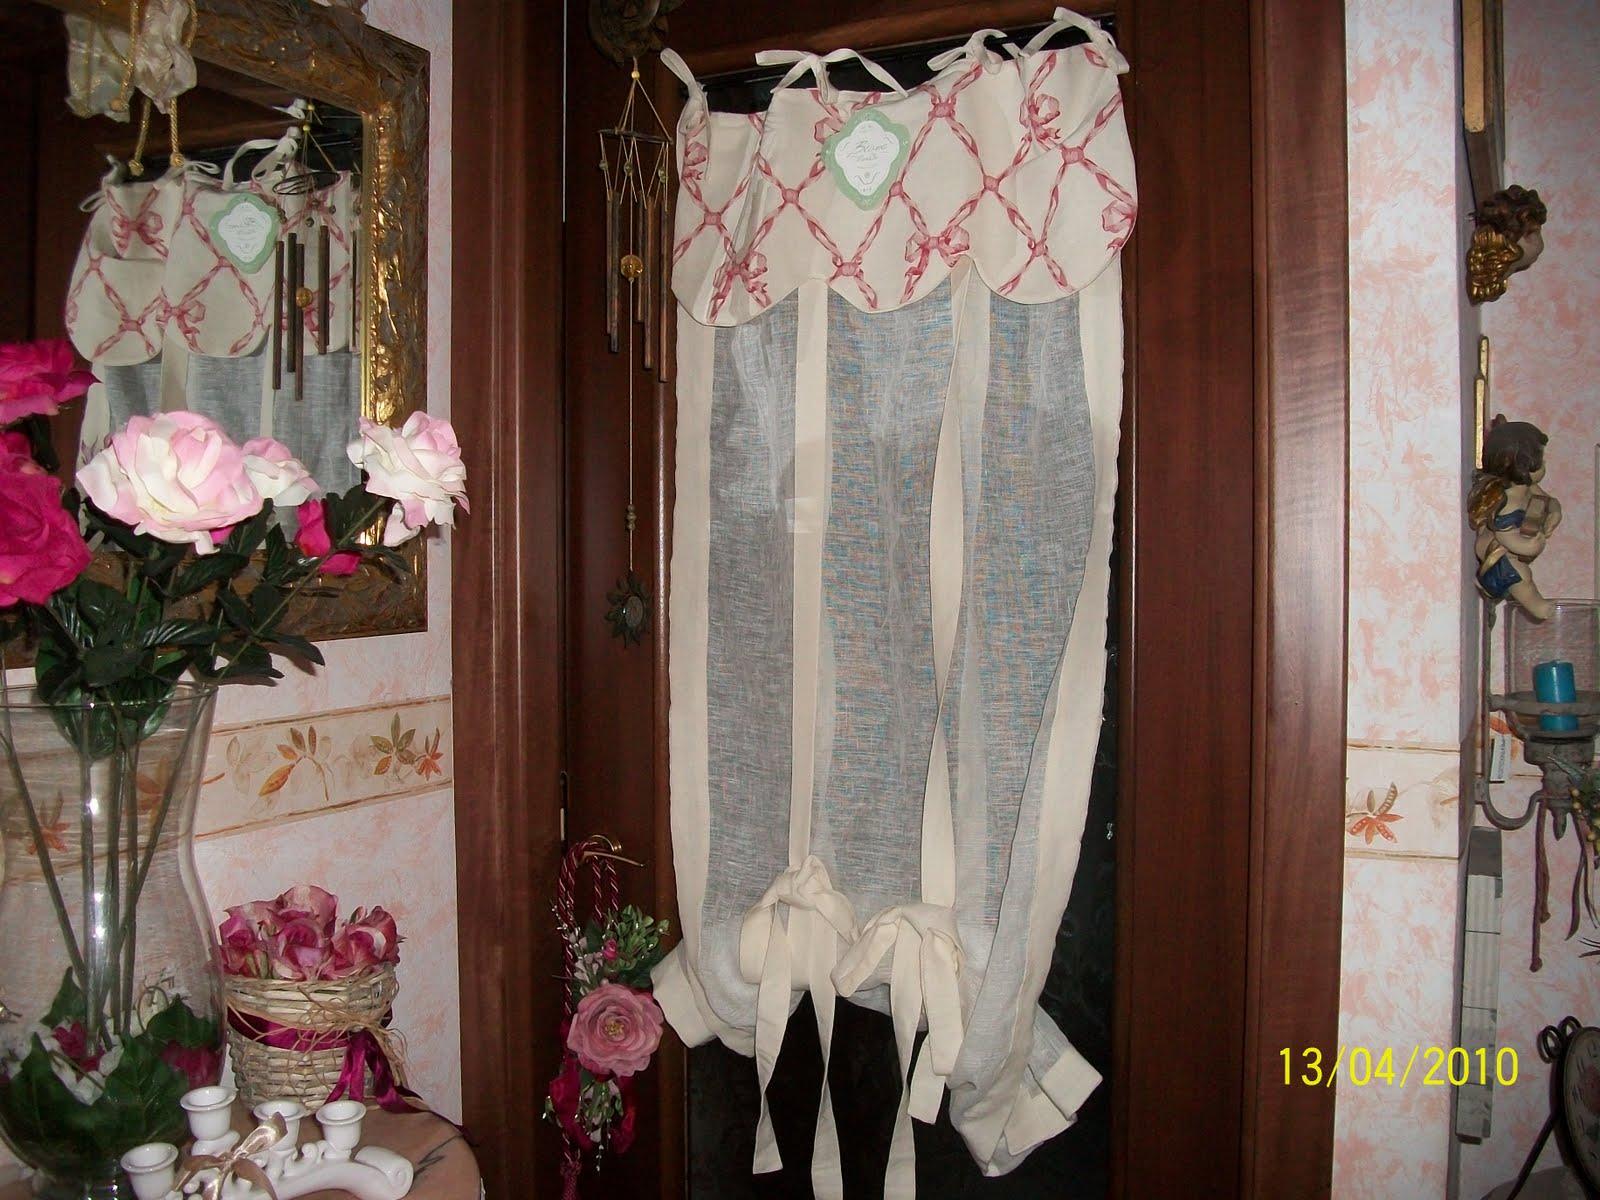 My shabby life blanc mariclo 39 in my home - Blanc mariclo mobili ...